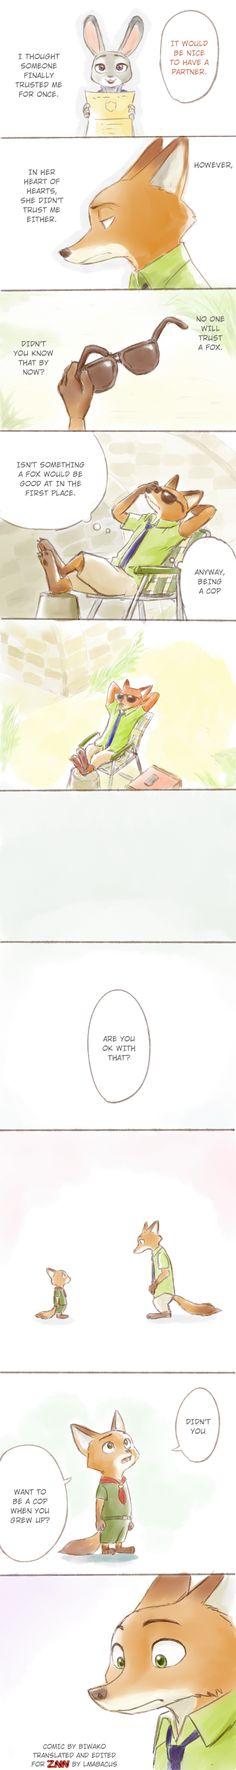 Comic: Memories from the Past (Original by biwako) - Zootopia News Network